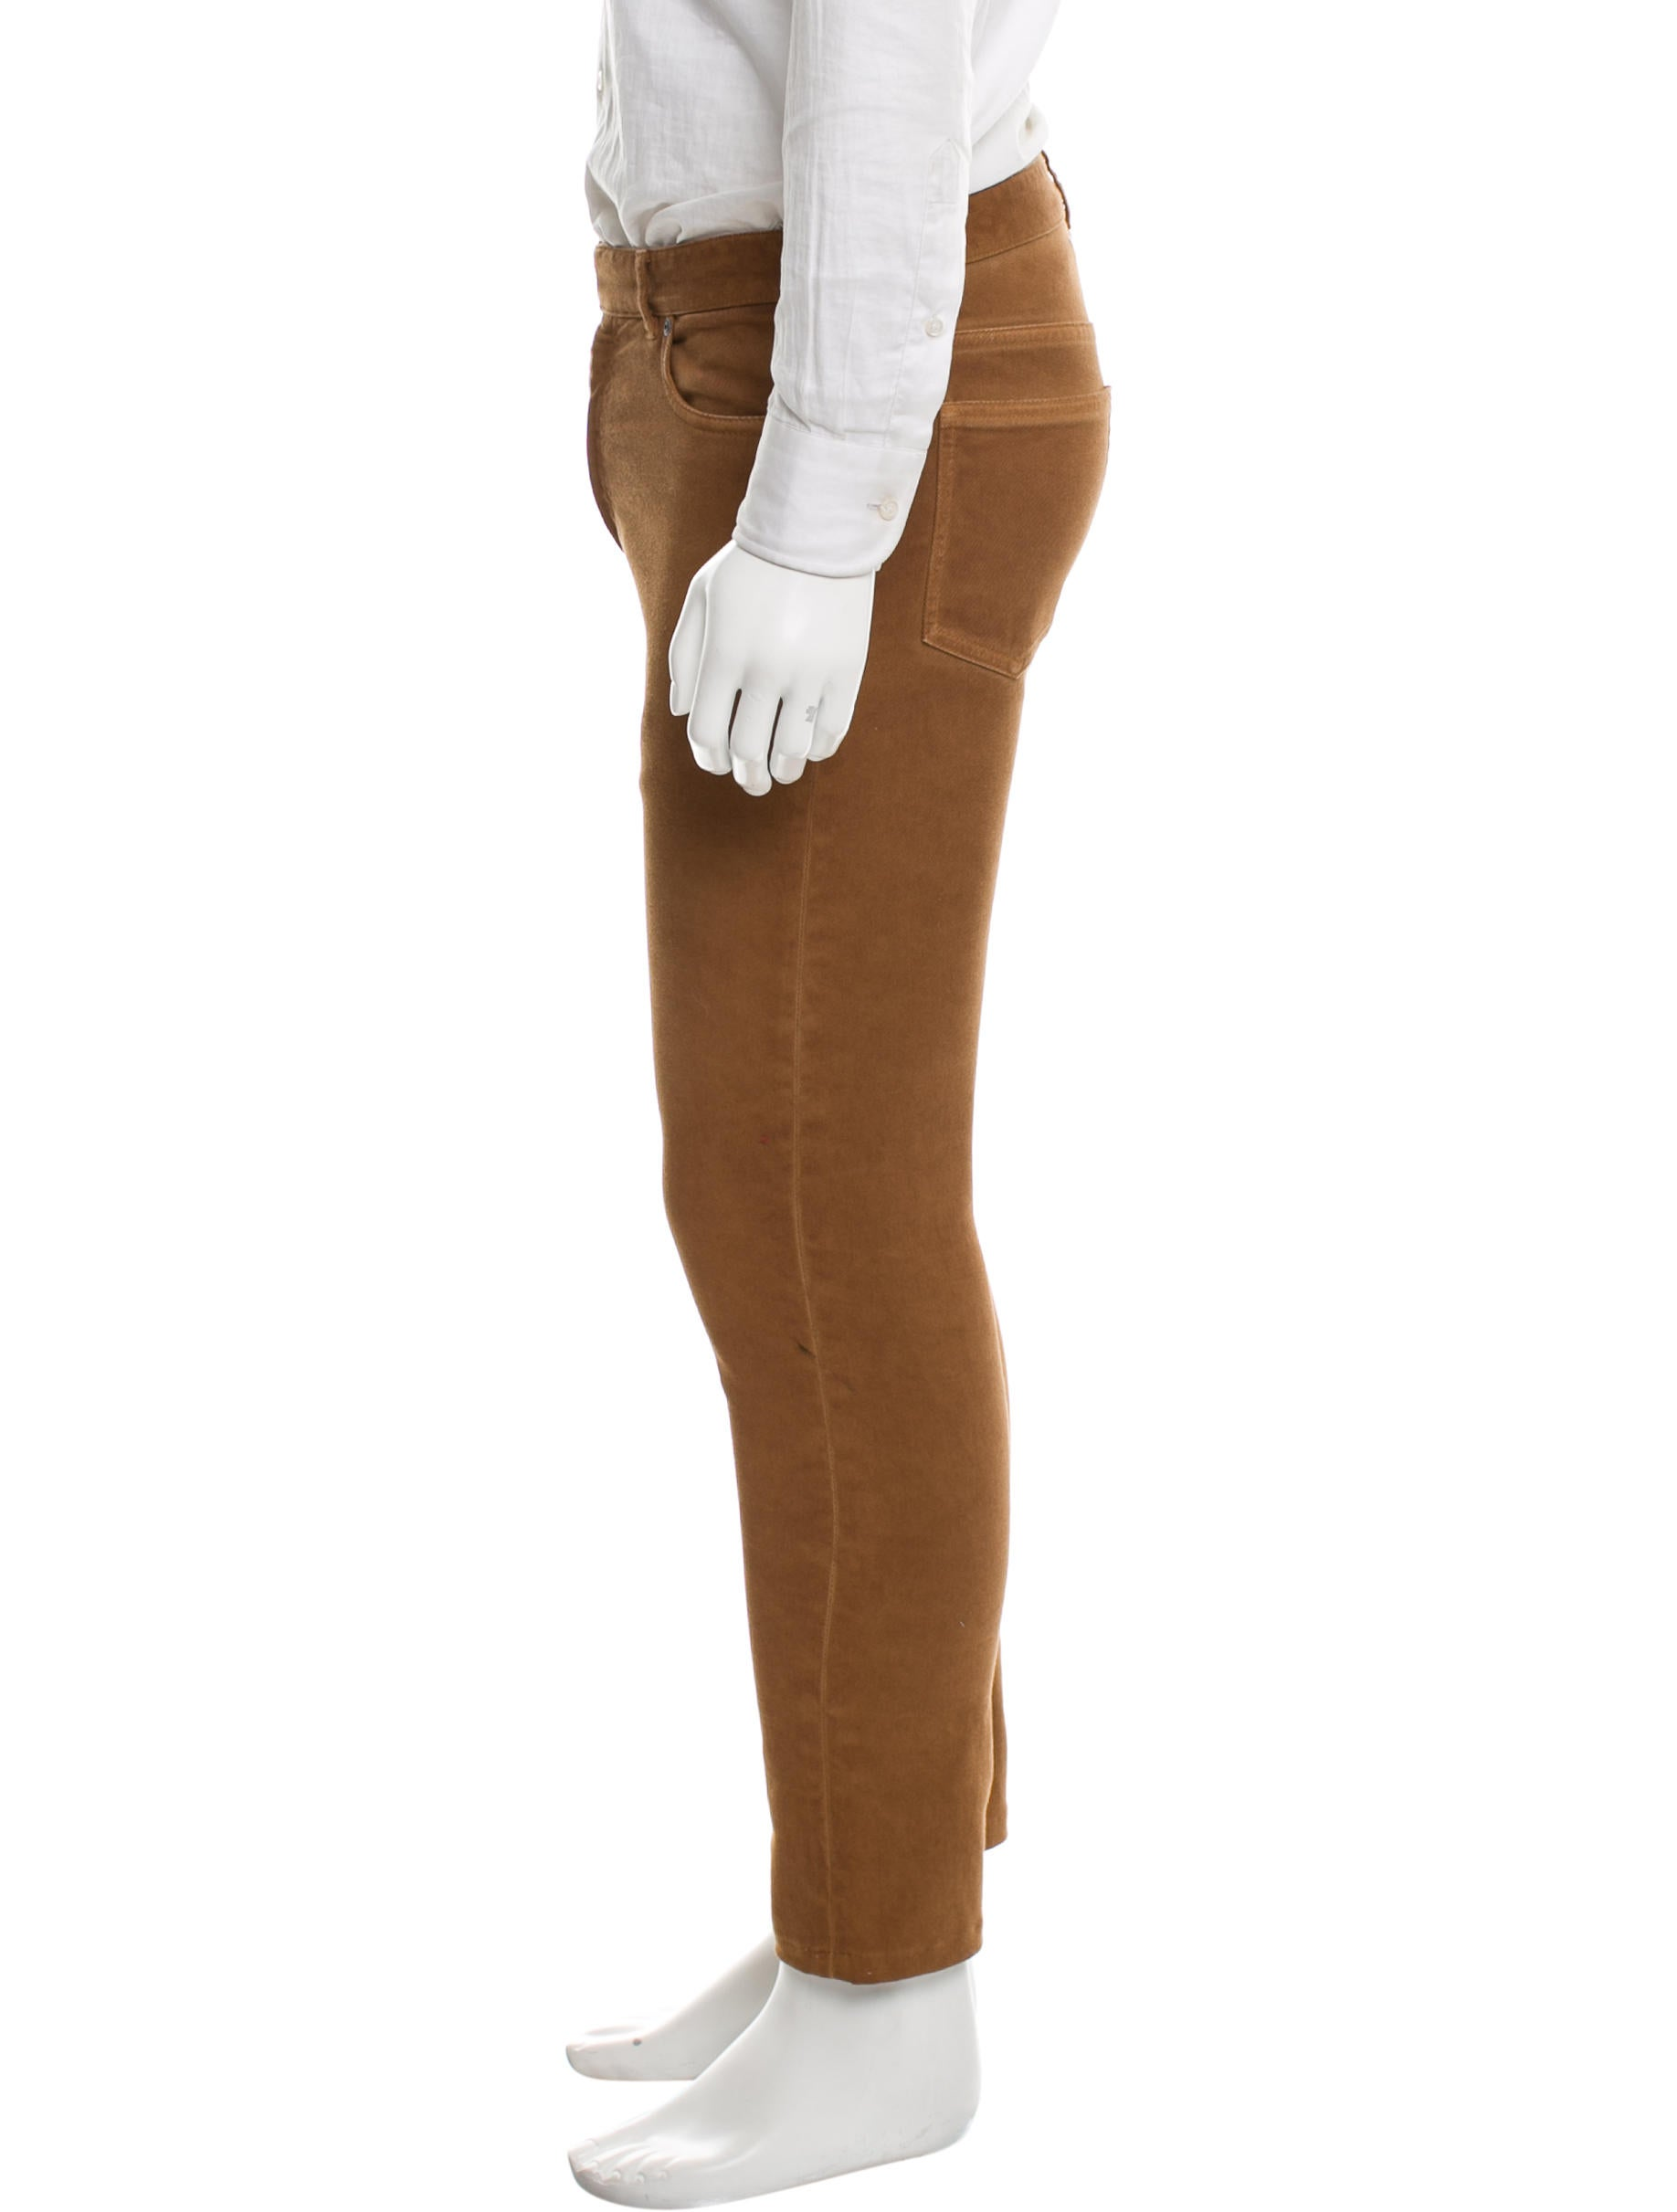 Maison margiela slim jeans clothing mai30262 the for 10 moulmein rise la maison